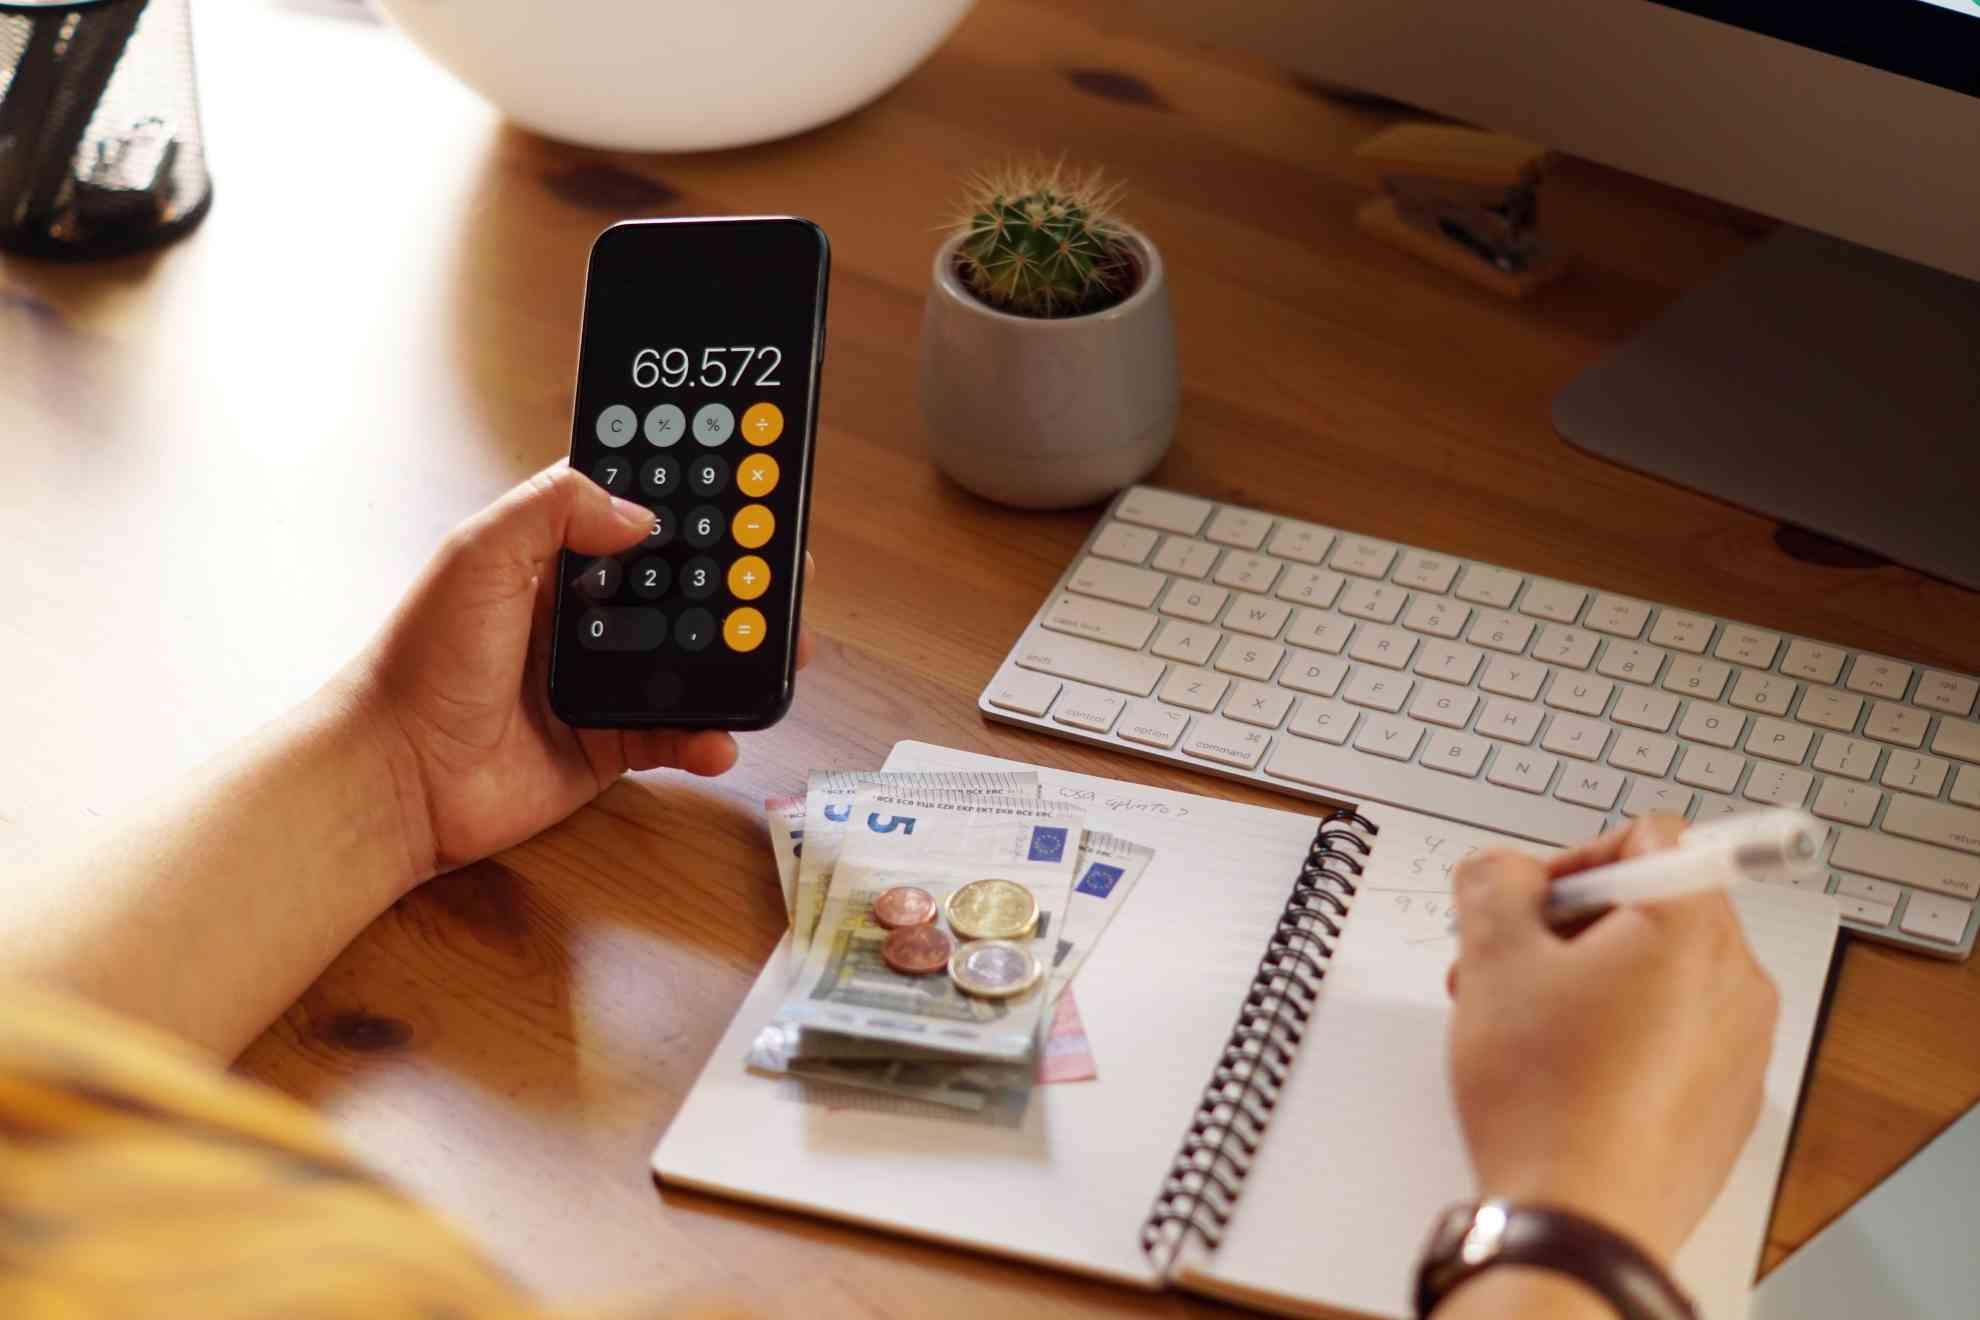 Finanzierungskonzept, Finanzierungsvergleich, Mieten oder Kaufen, Finanzierungsbudget, Finanzierungsanfrage, Zinschart